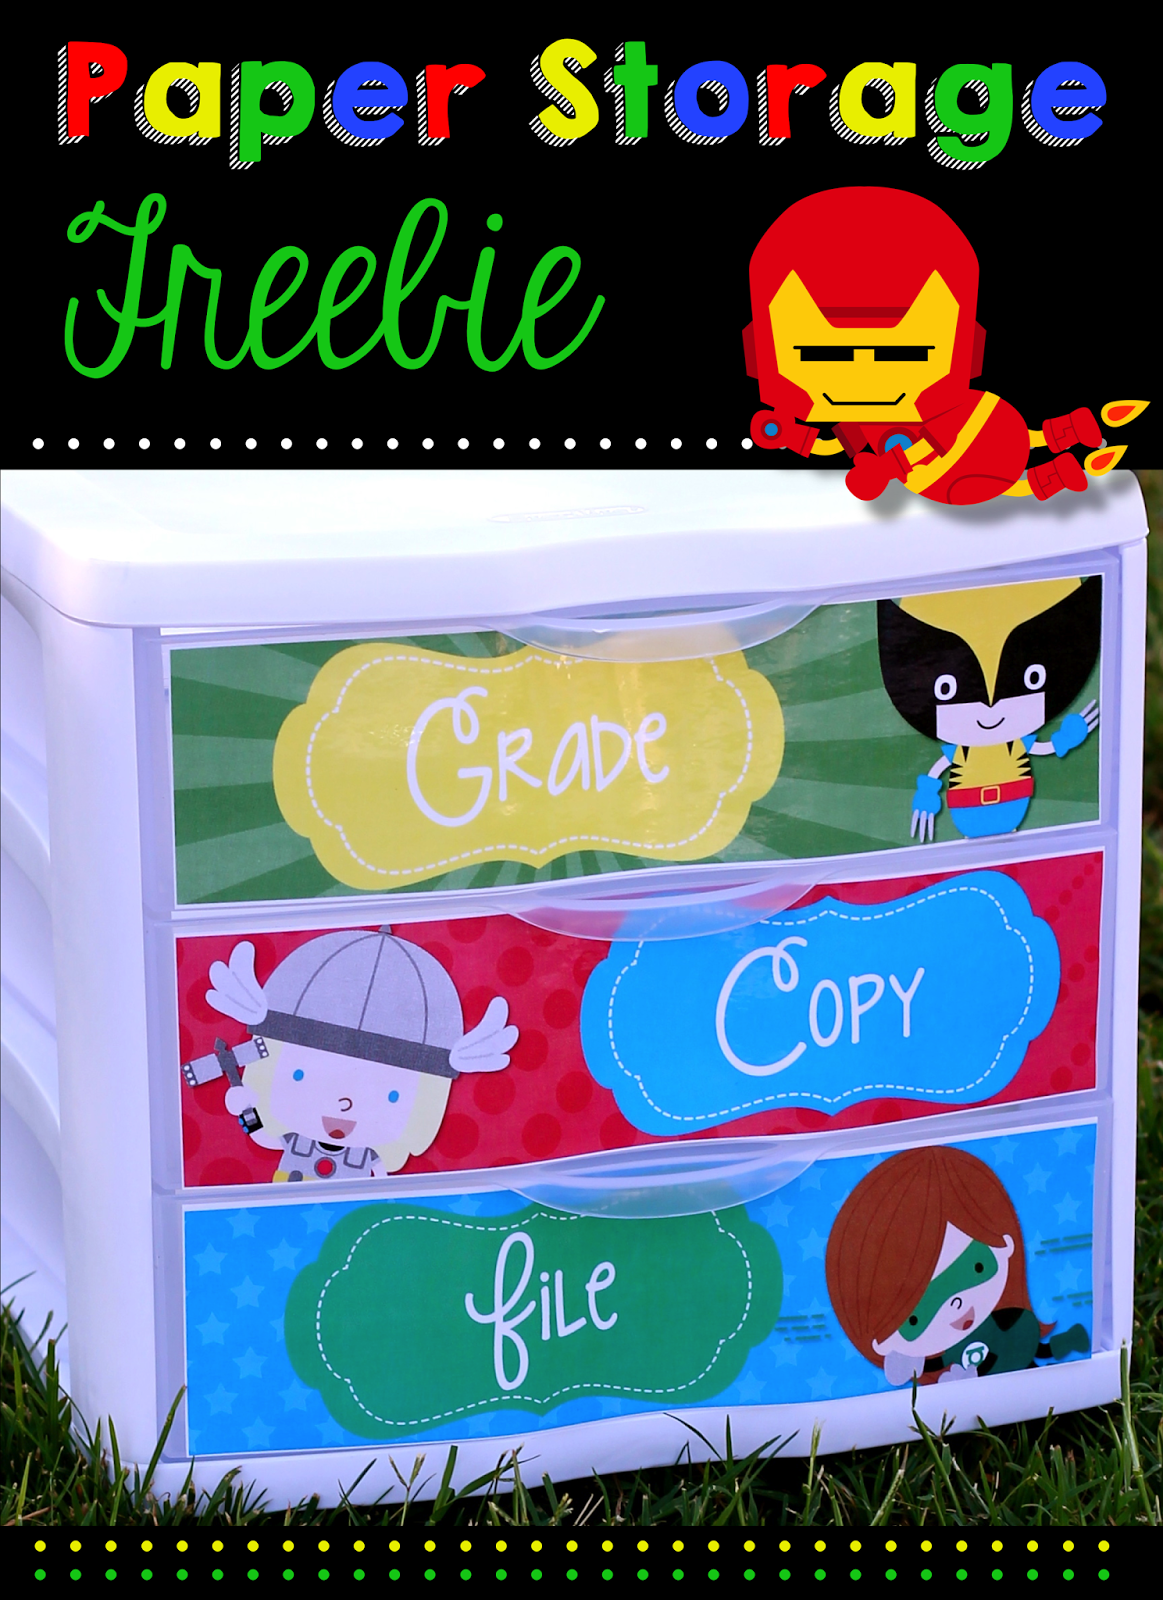 http://www.teacherspayteachers.com/Product/To-Do-Drawer-Freebie-Super-Hero-Edition-1288252